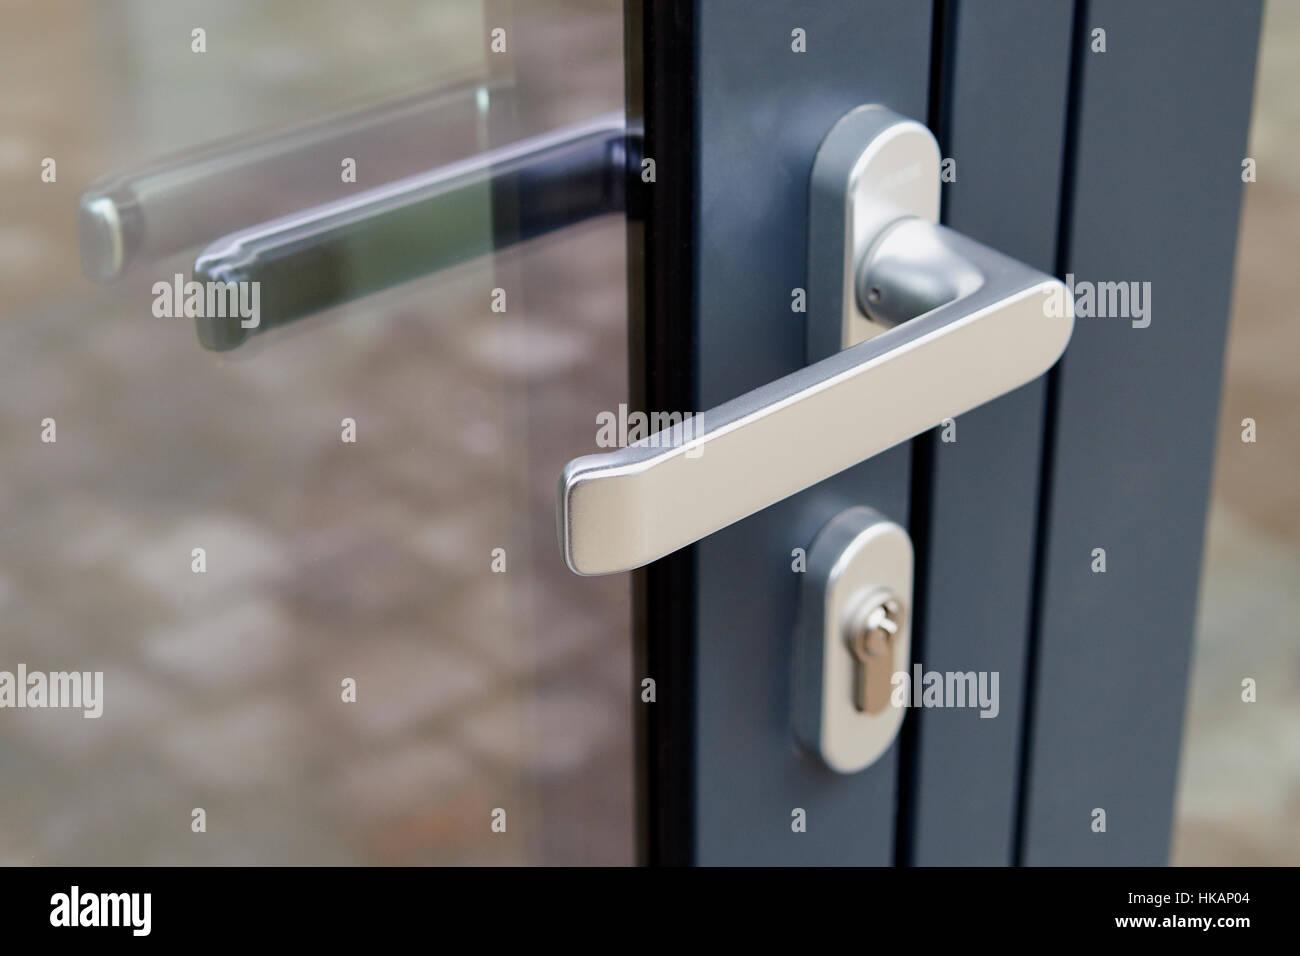 Exterior Door Handle And Security Lock On Metal Frame Low Deep Of